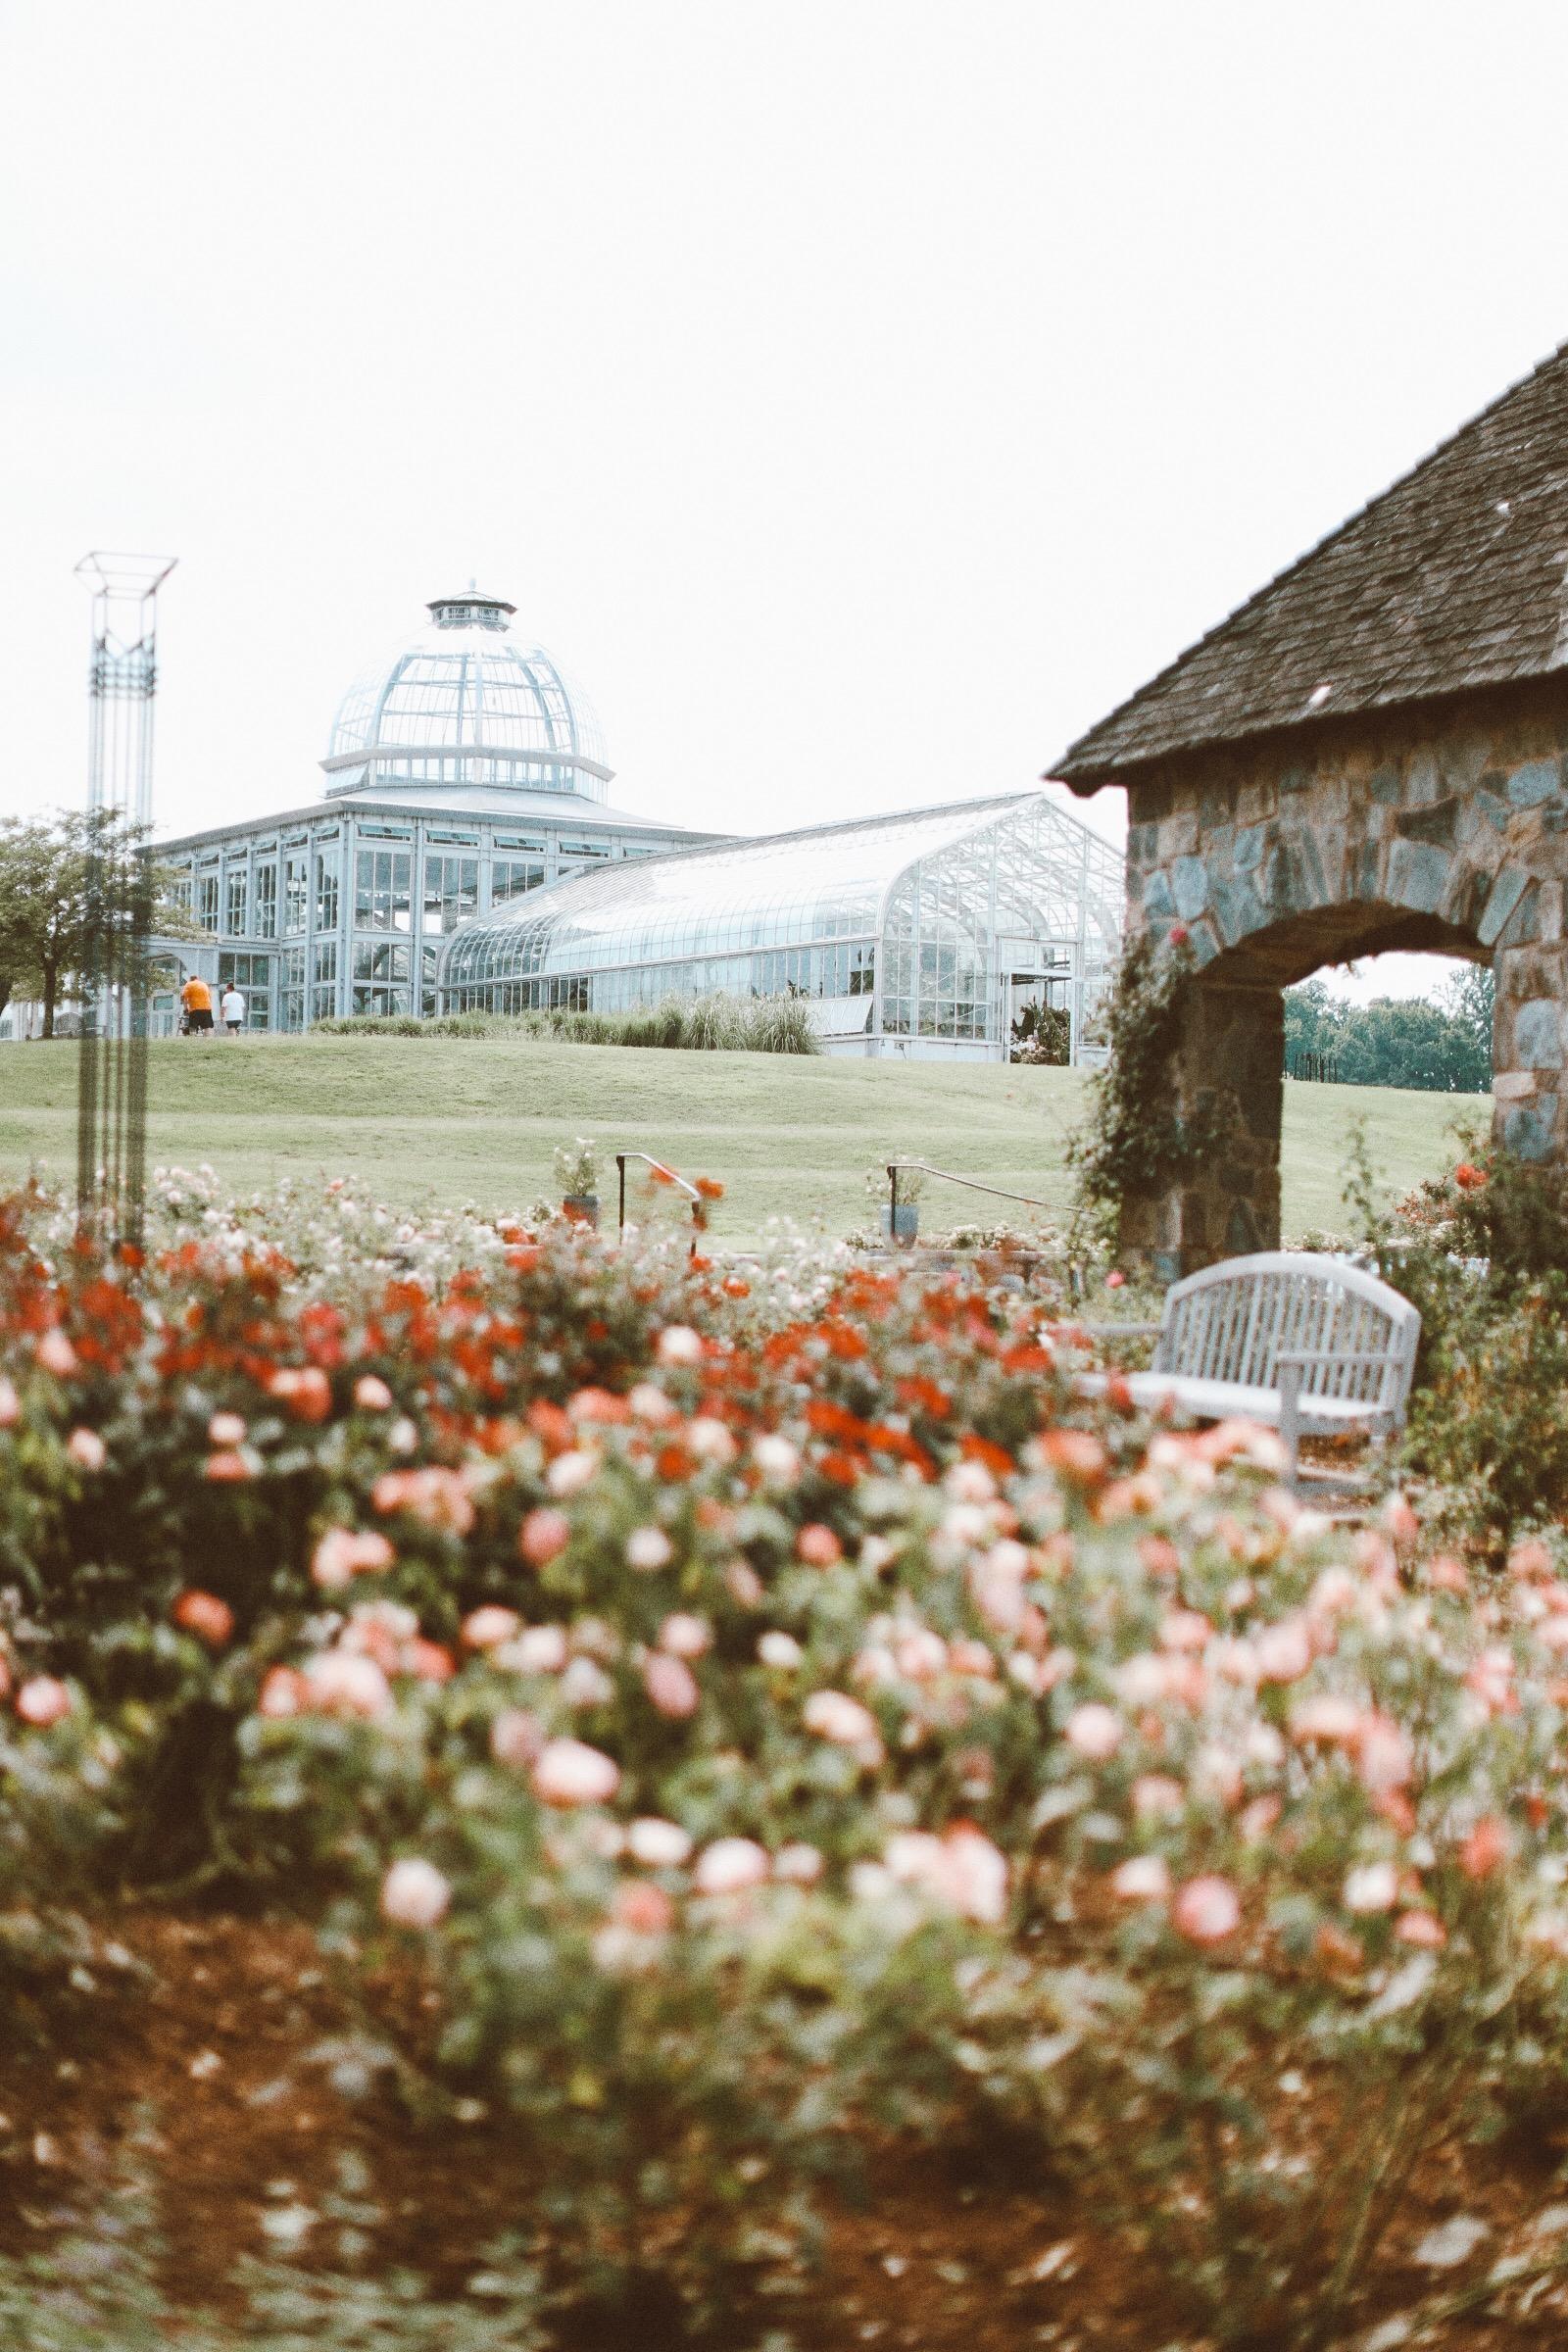 images above & below: Lewis Ginter Botanical gardens